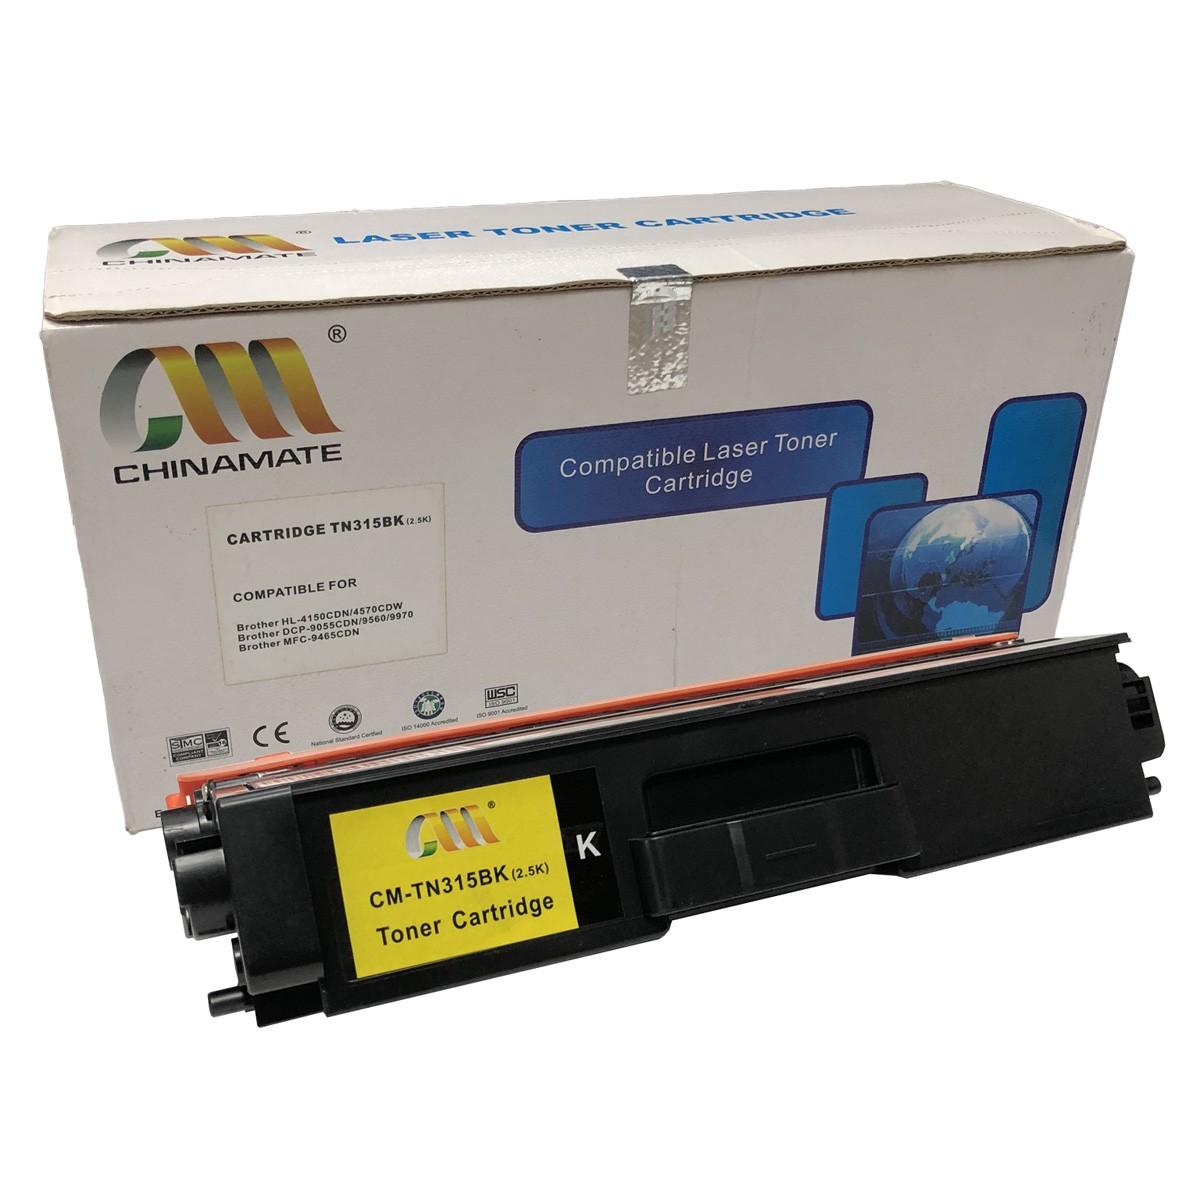 Toner Chinamate TN315BK Compatível com HL4140CN HL4570CDW da Brother